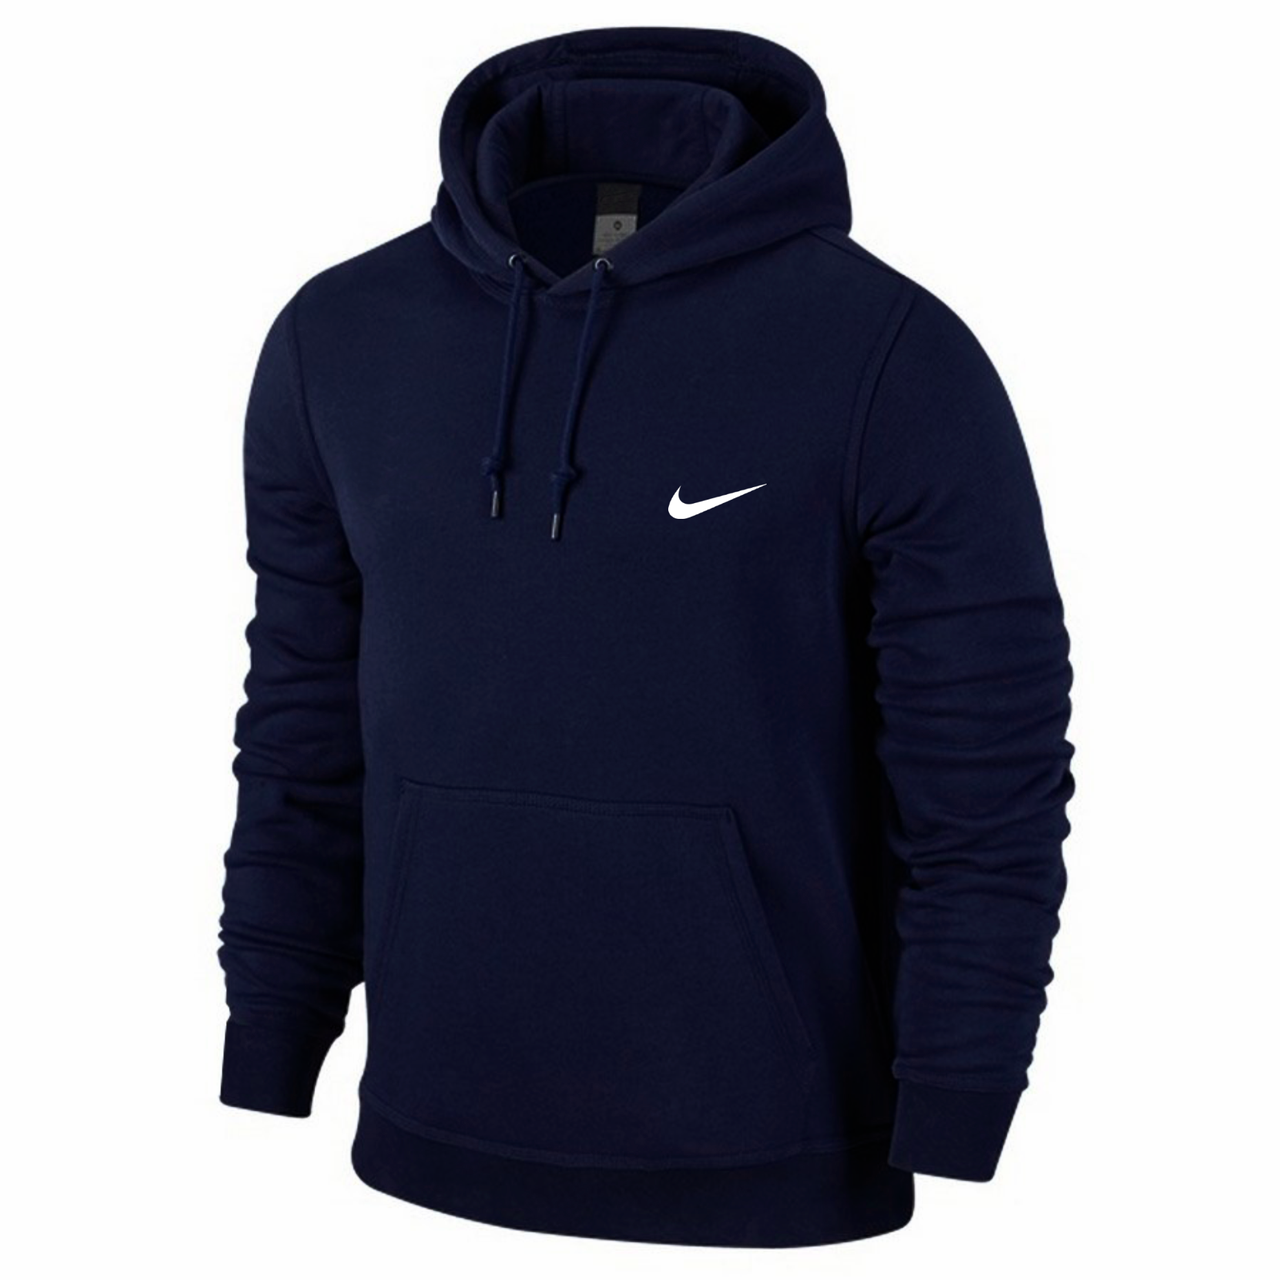 Толстовка мужская кенгуру Nike, синяя